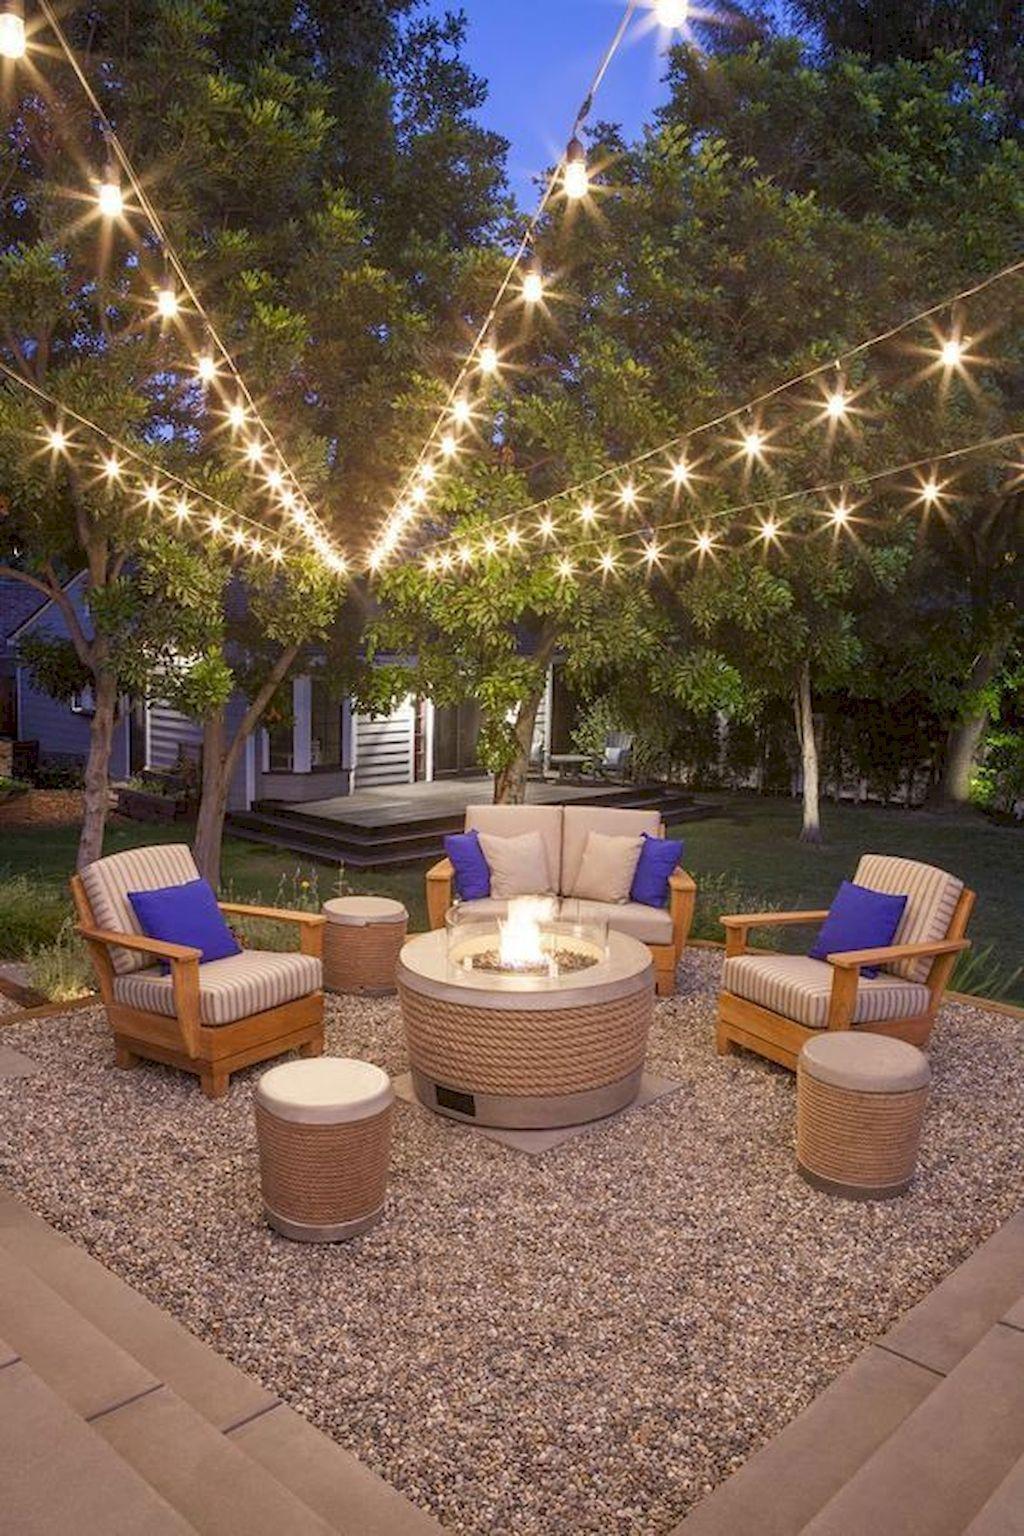 02 Summery Diy Backyard Projects Ideas To Mesmerizing Your Summer Homeideas Co Fire Pit Backyard Backyard Fire Backyard Patio